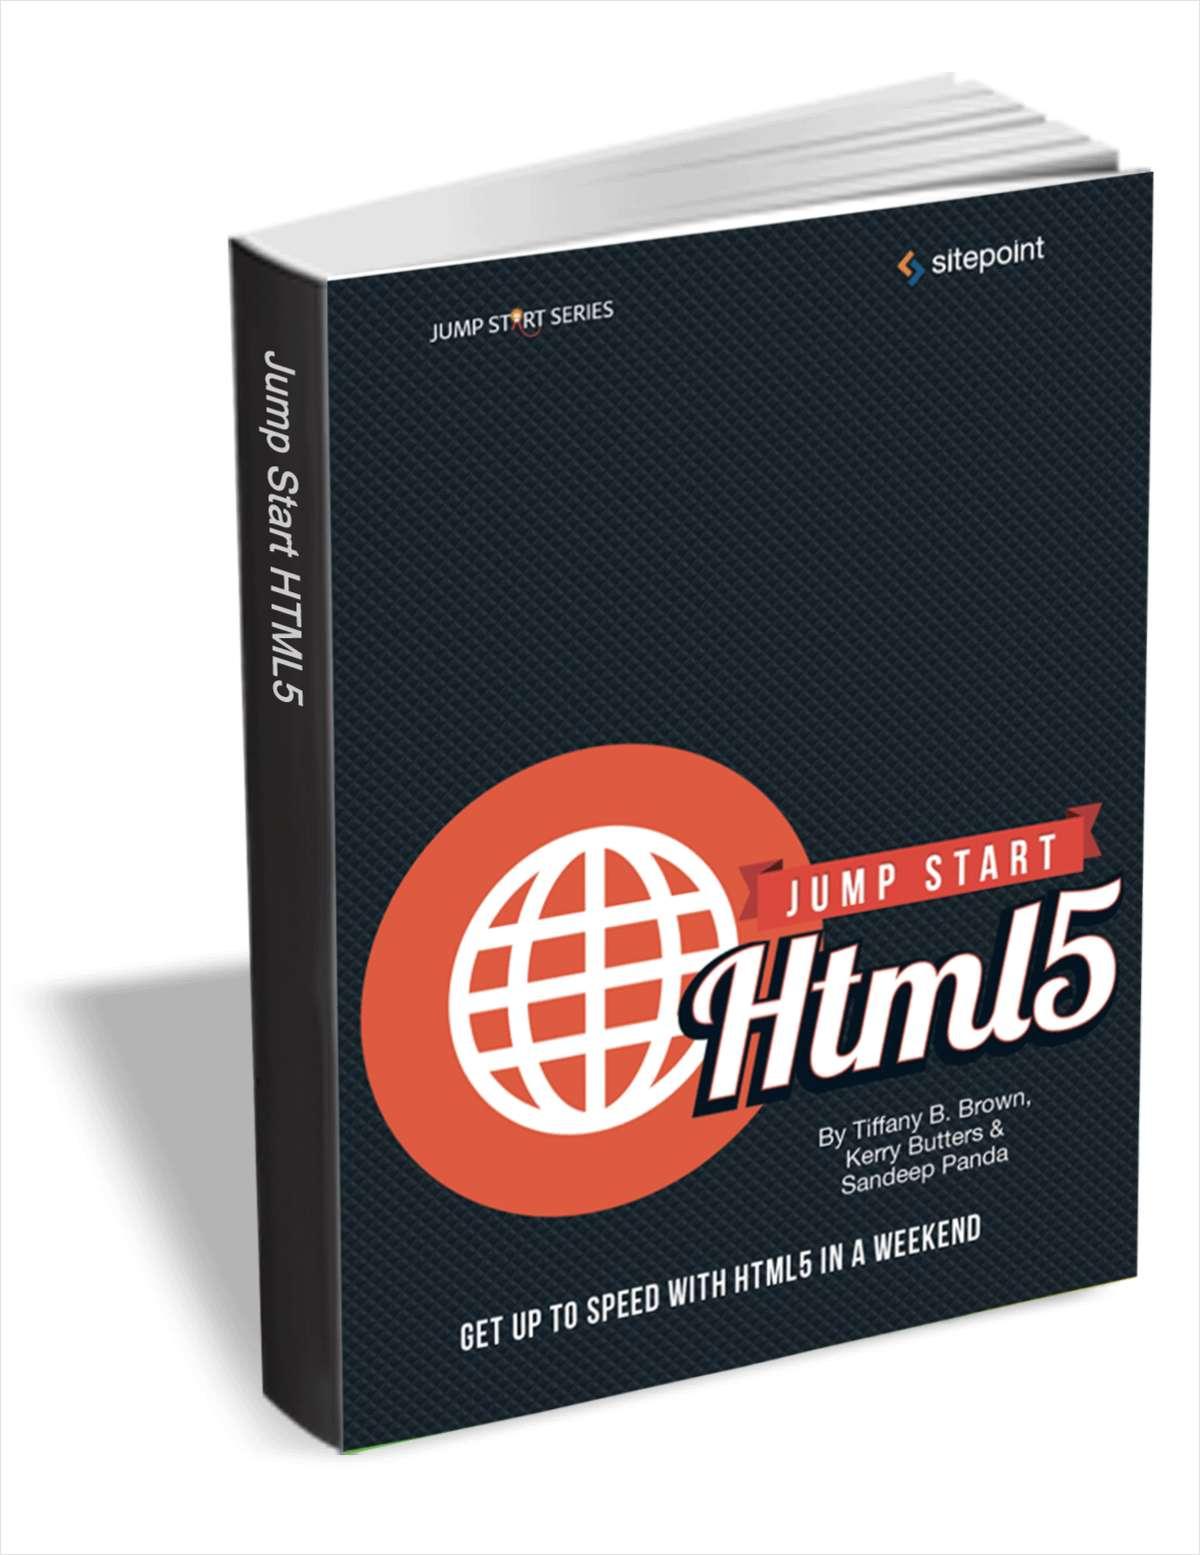 Jump Start HTML5 (A $30 Value) Free!